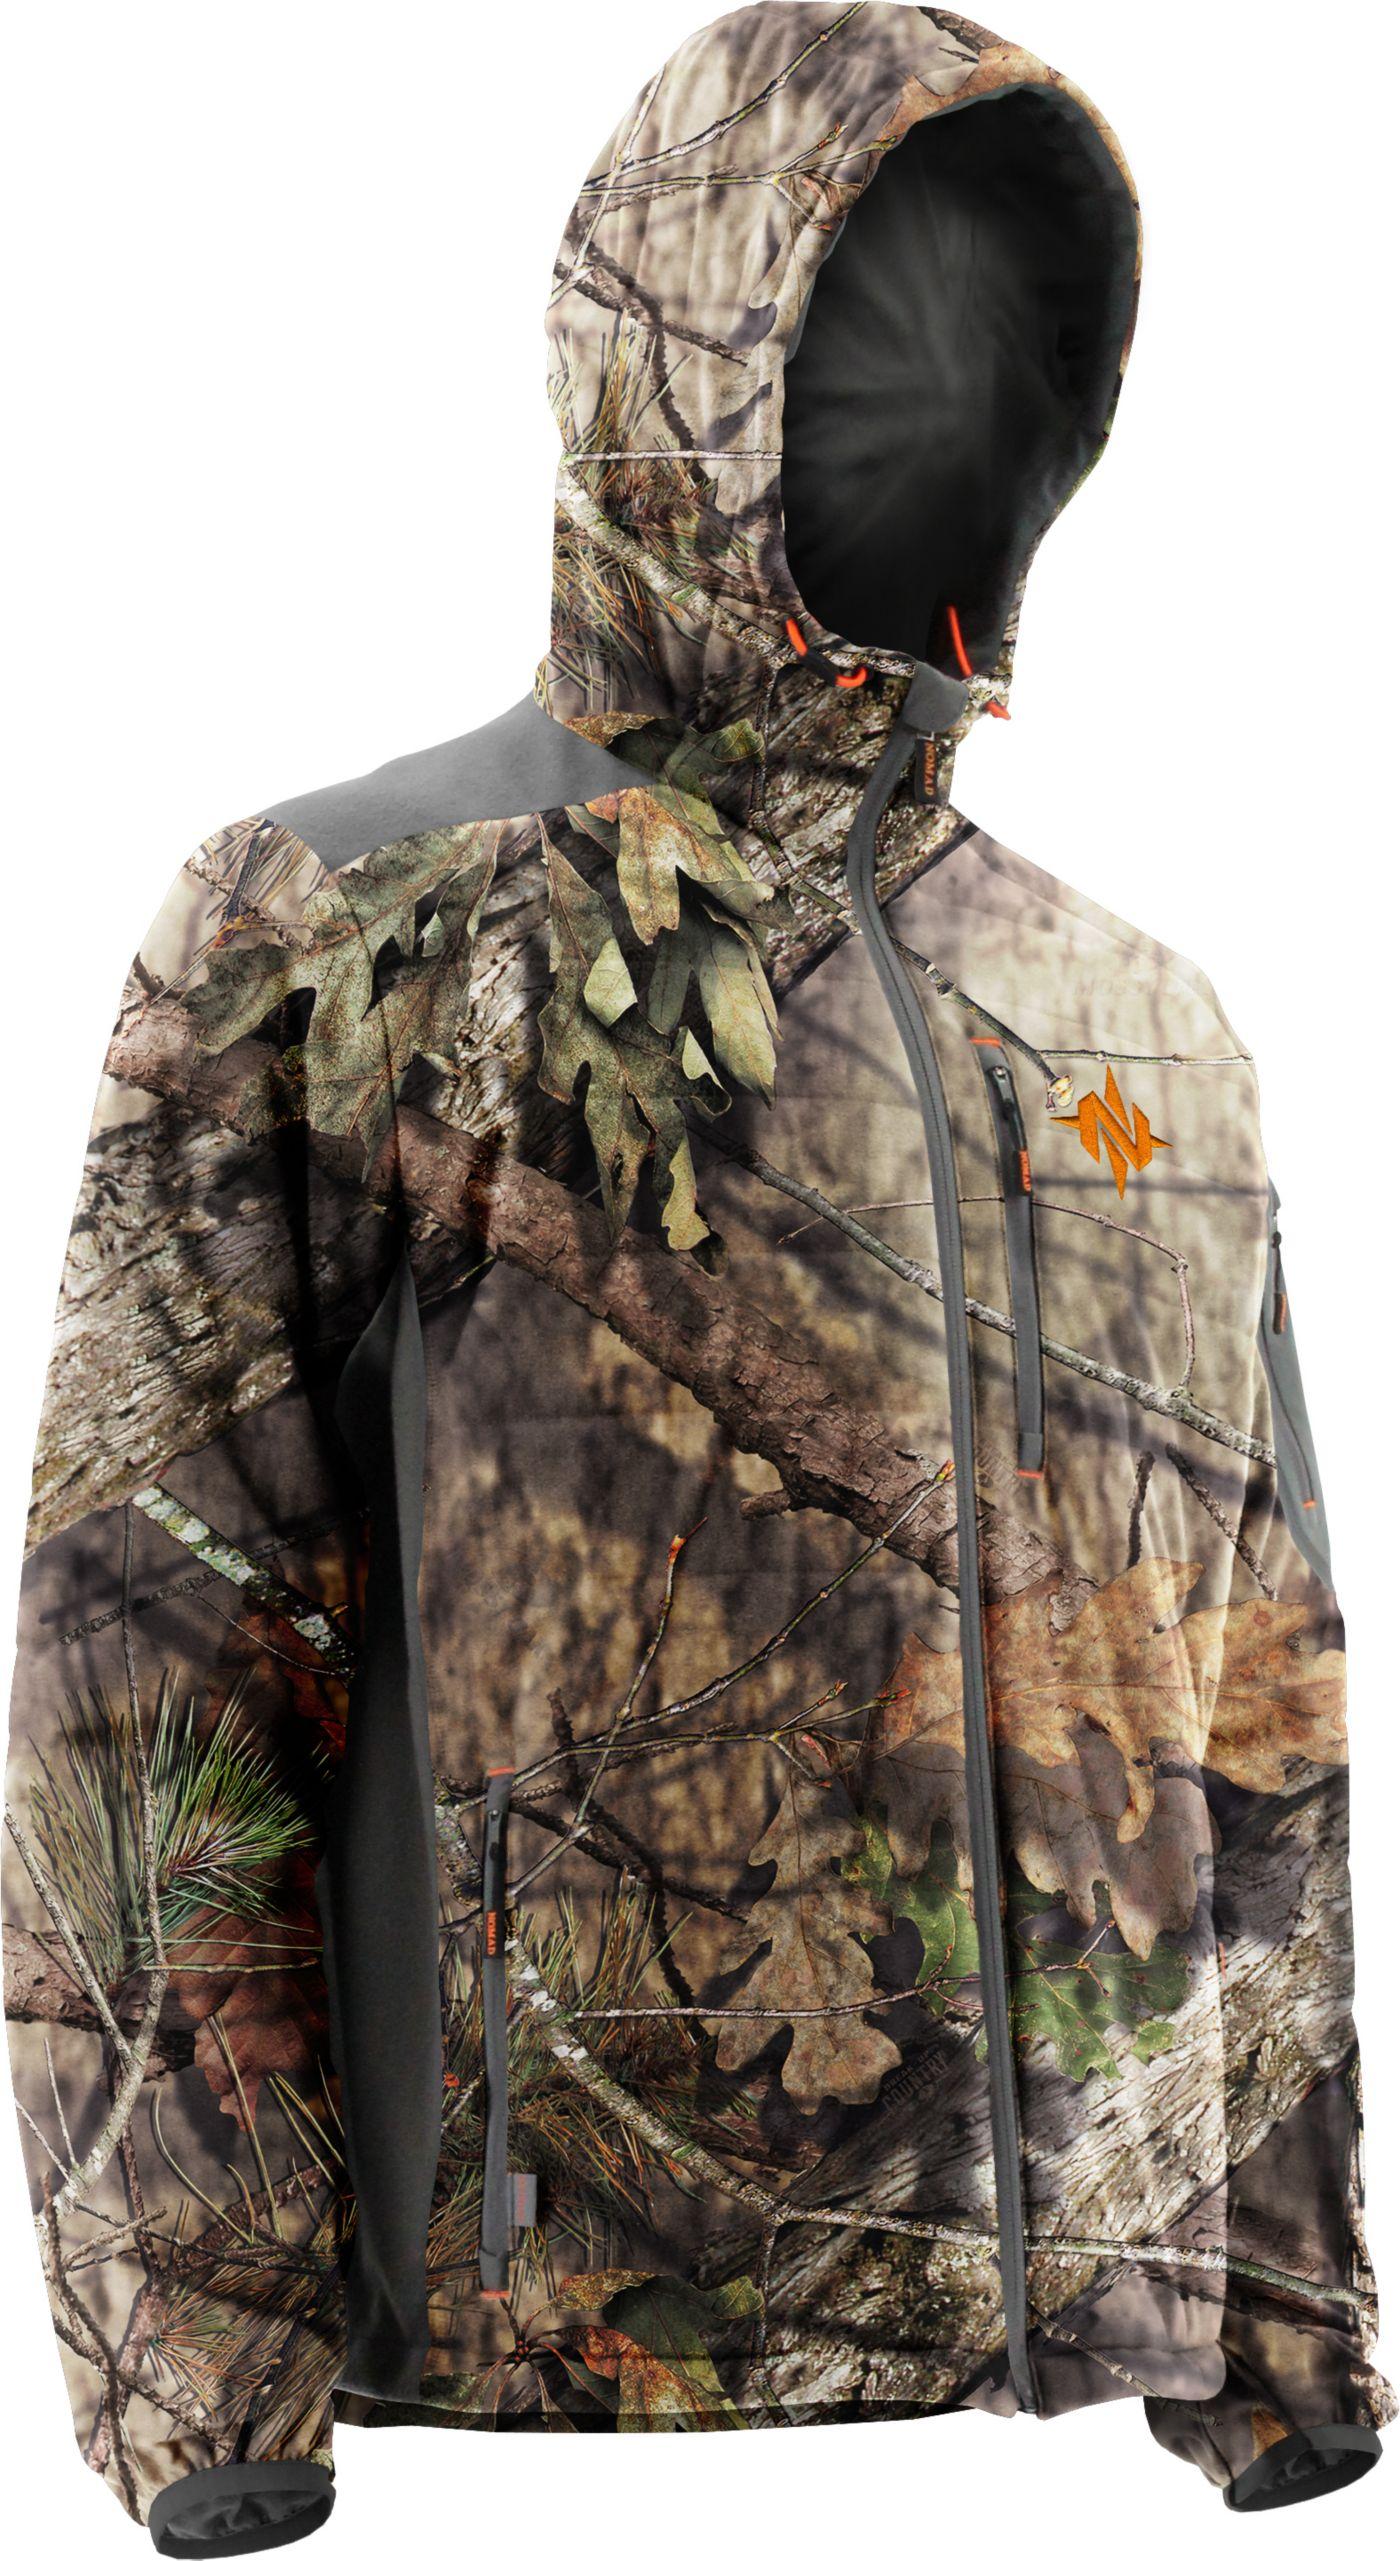 NOMAD Men's Dunn 2.0 Hunting Jacket